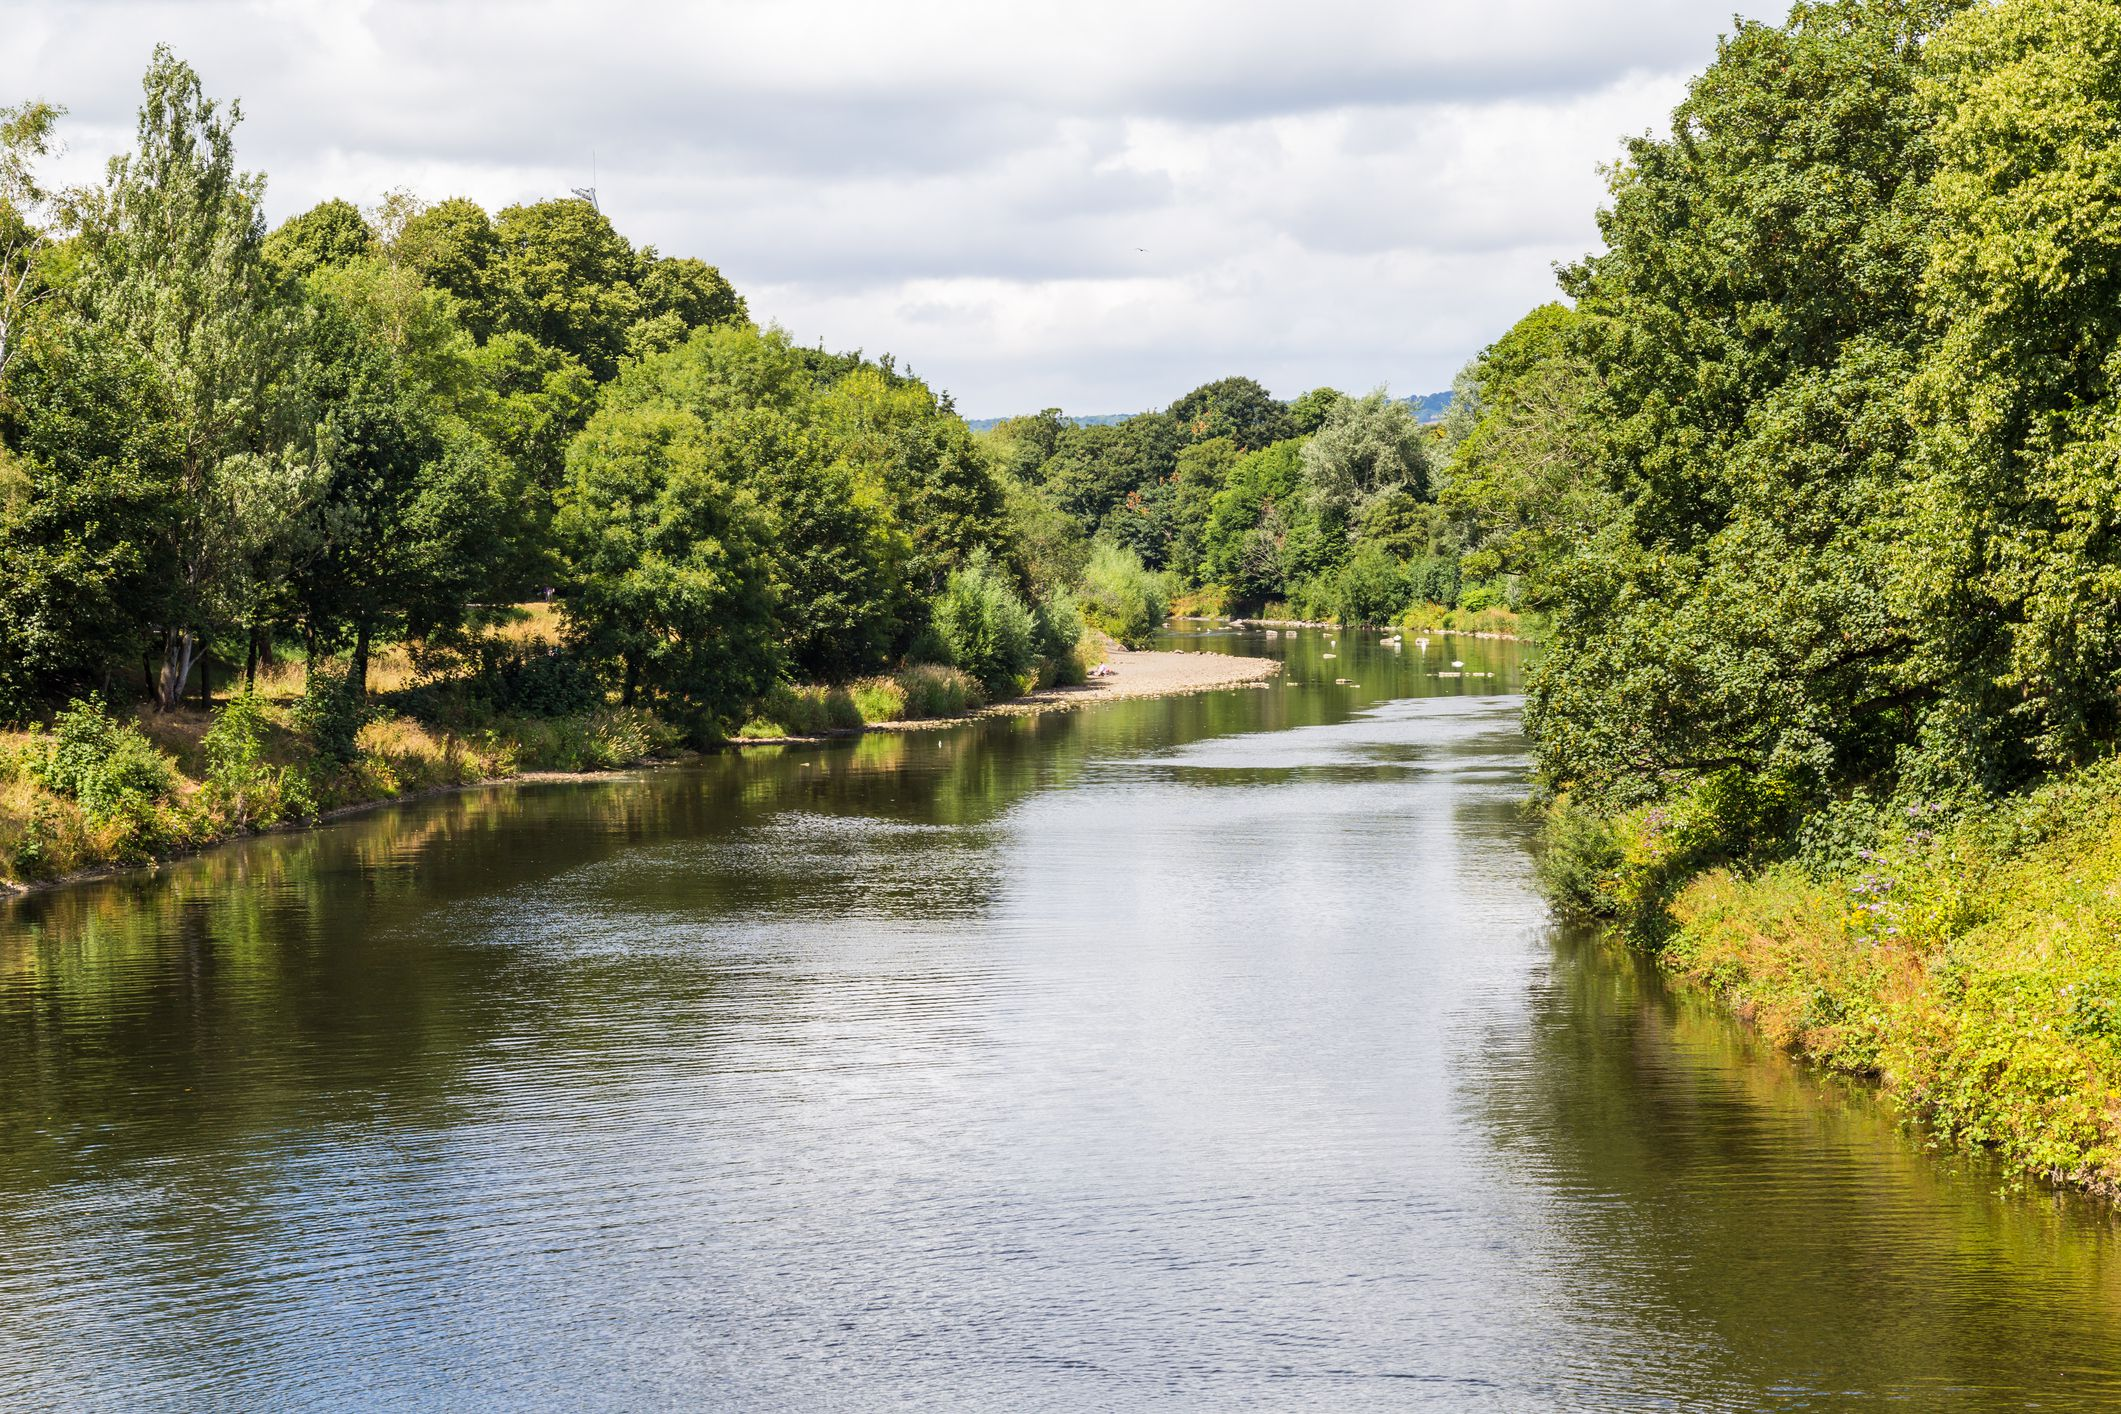 Taff River runs through Bute Park in Cardiff city center